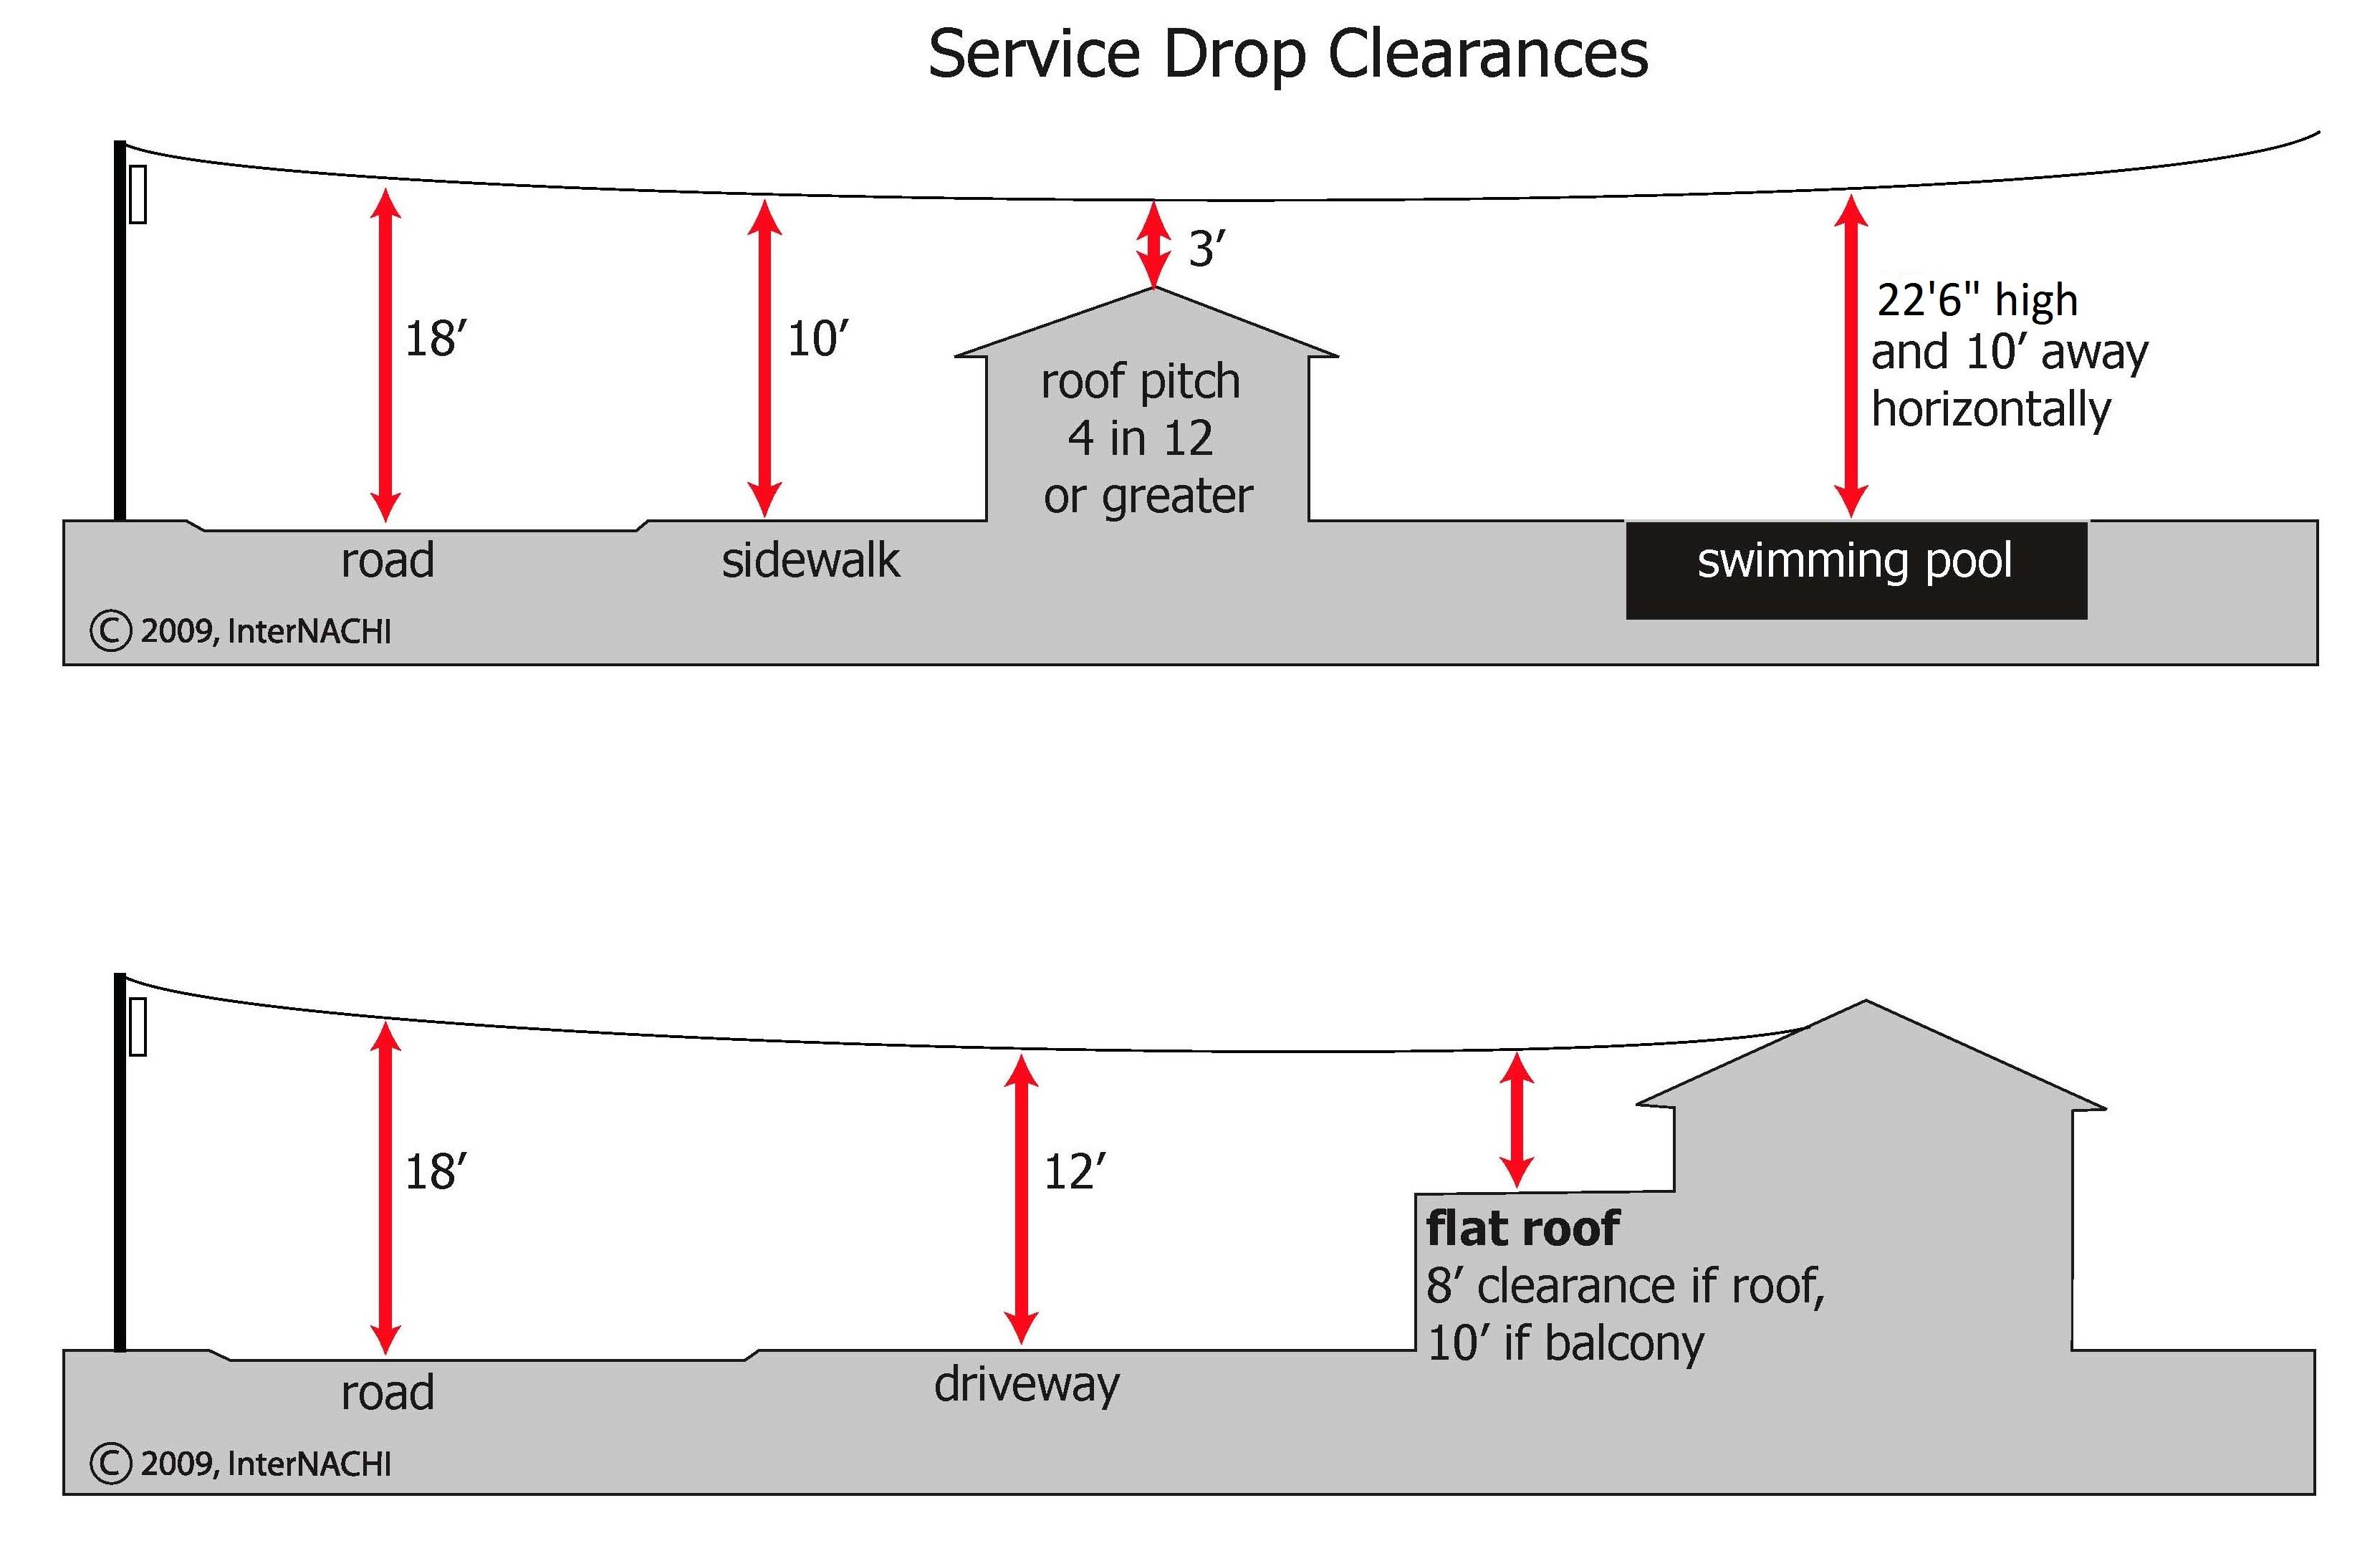 Service Drop Clearances.